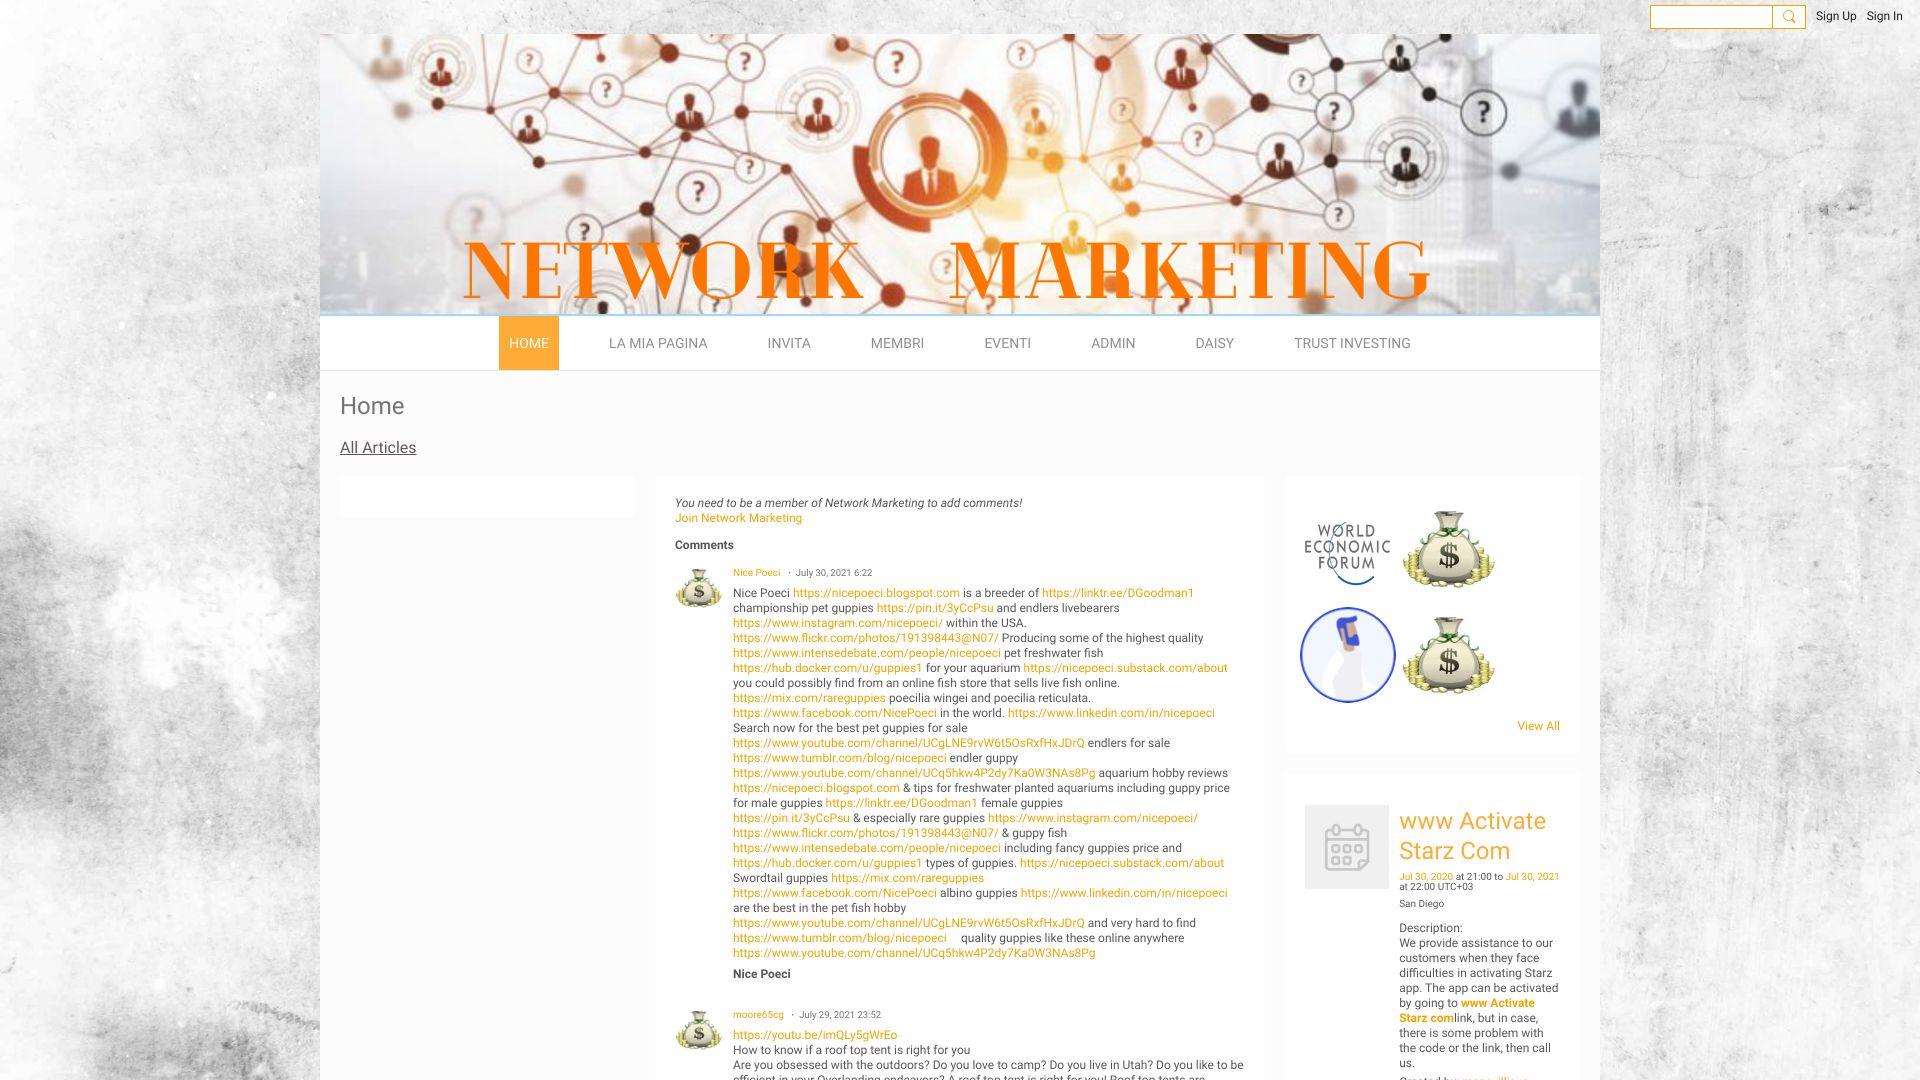 network-marketing.ning.com